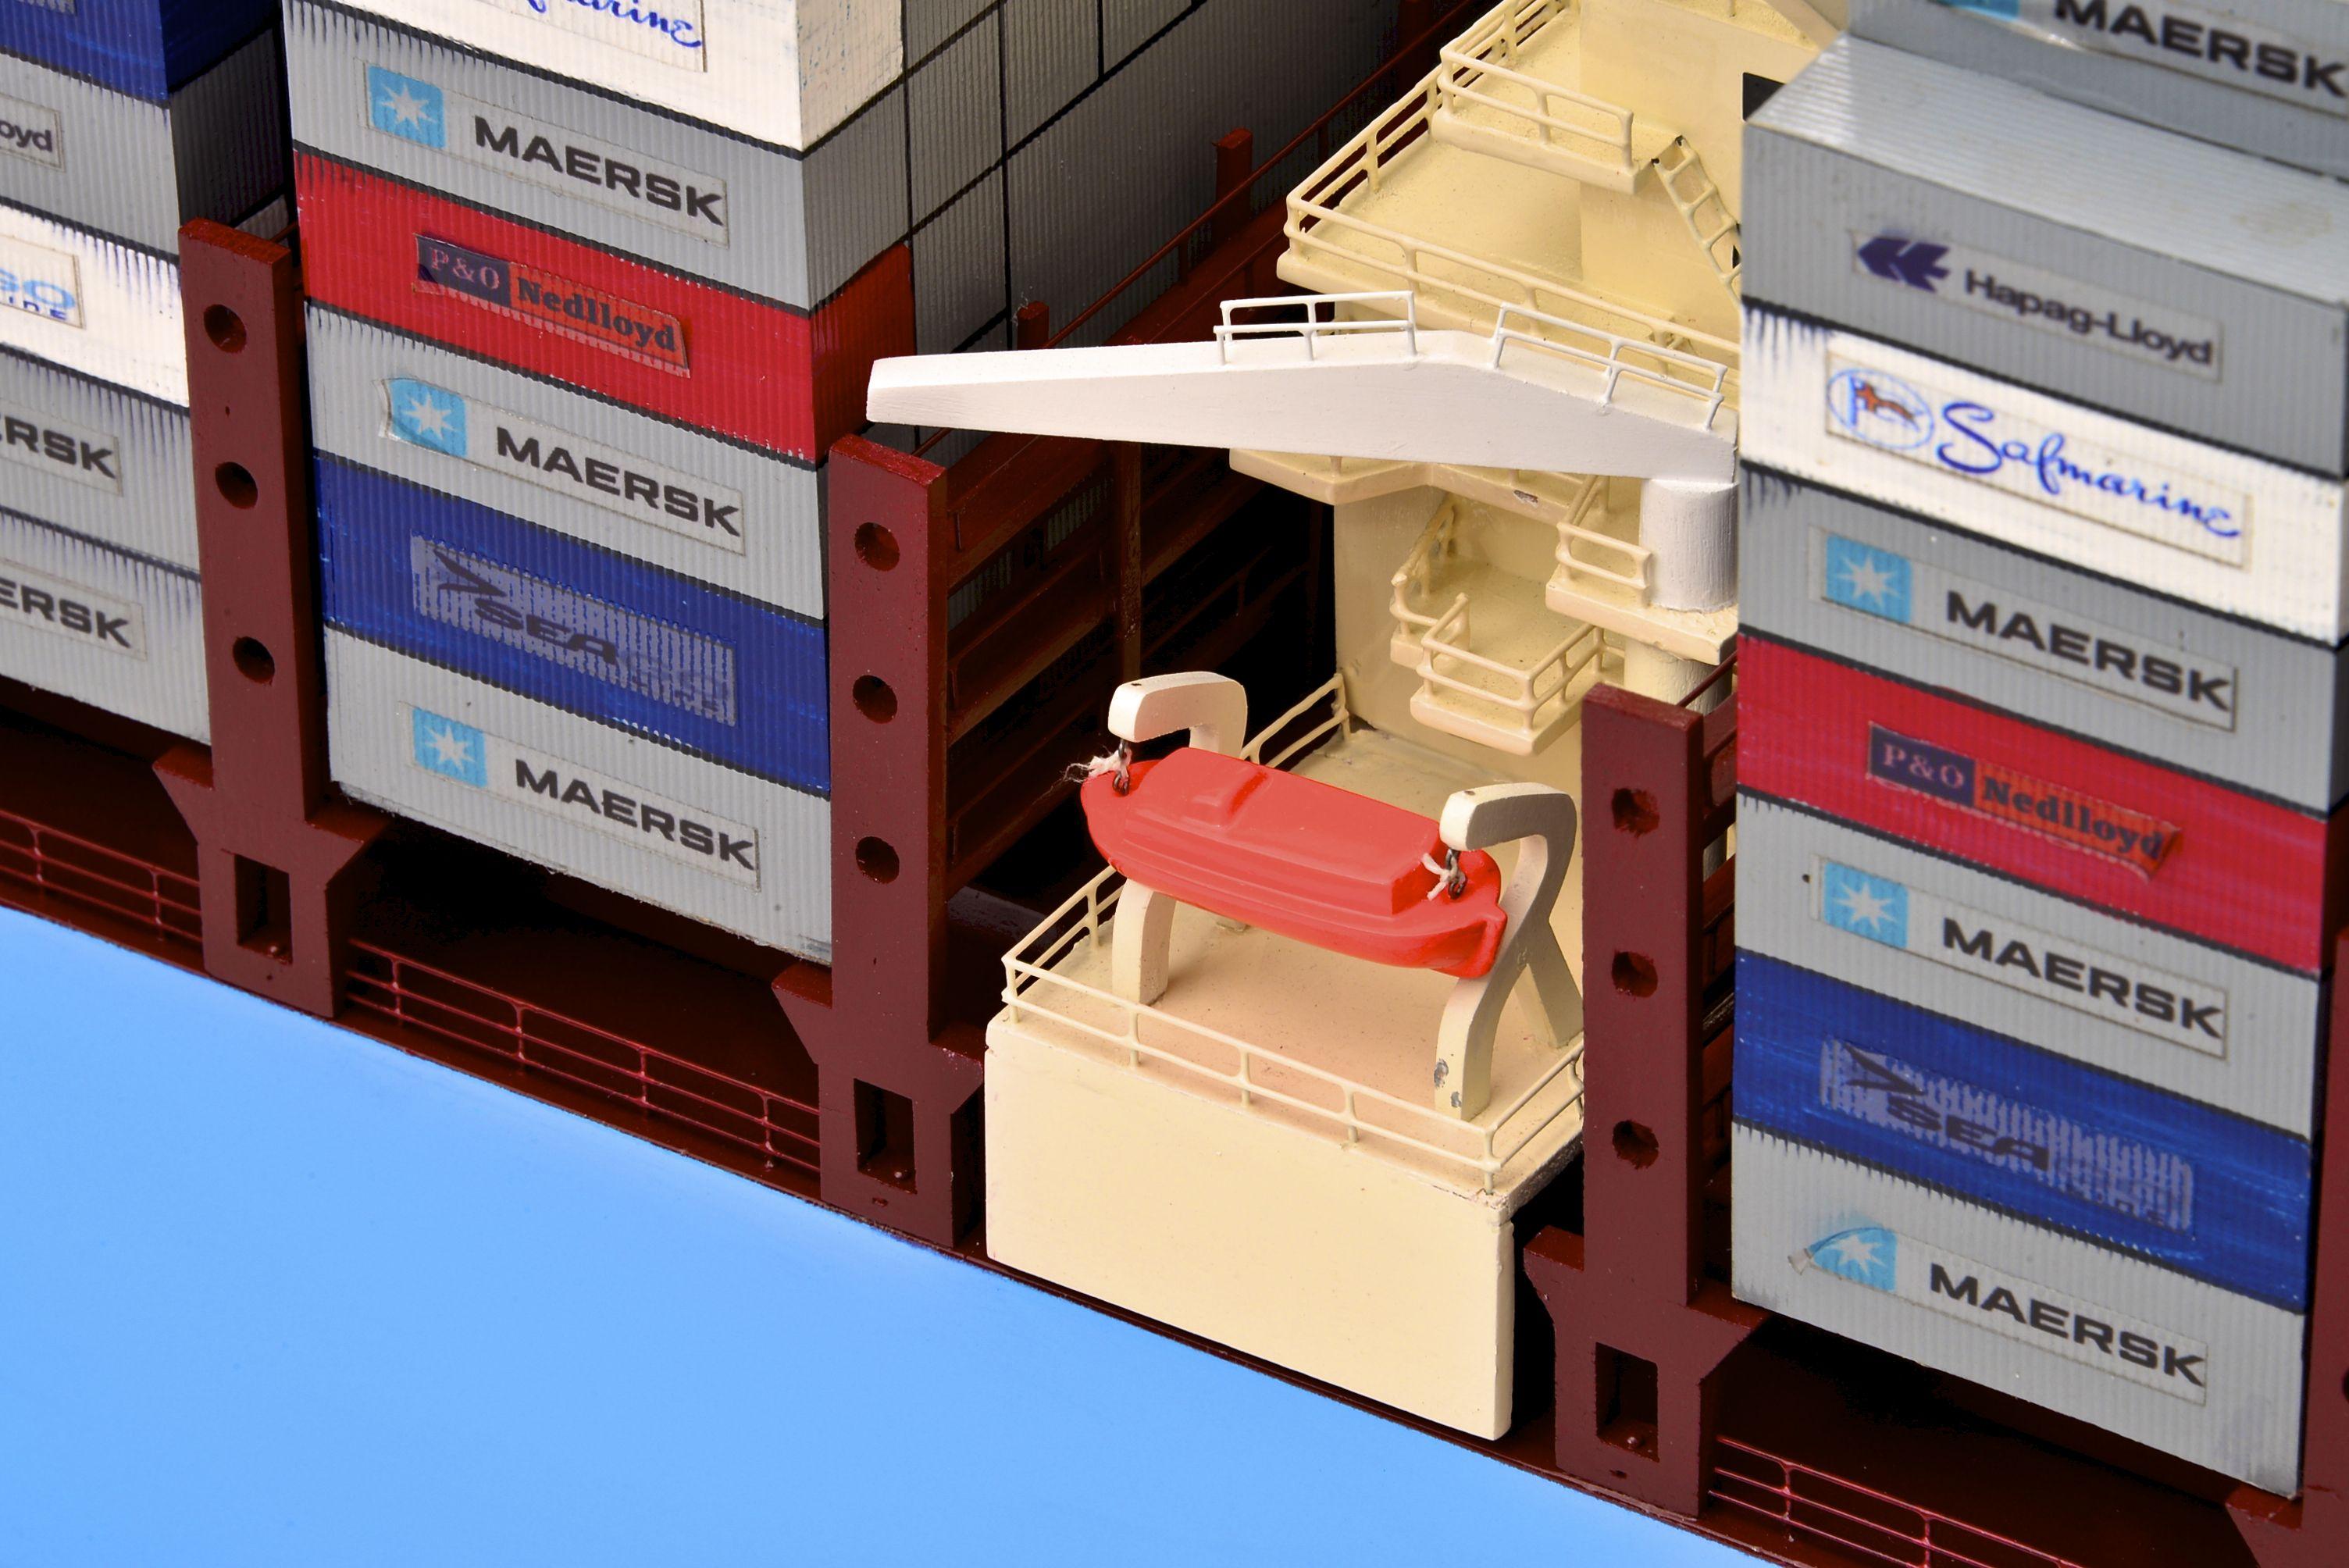 1812-10727-Emma-Maersk-Model-Ship